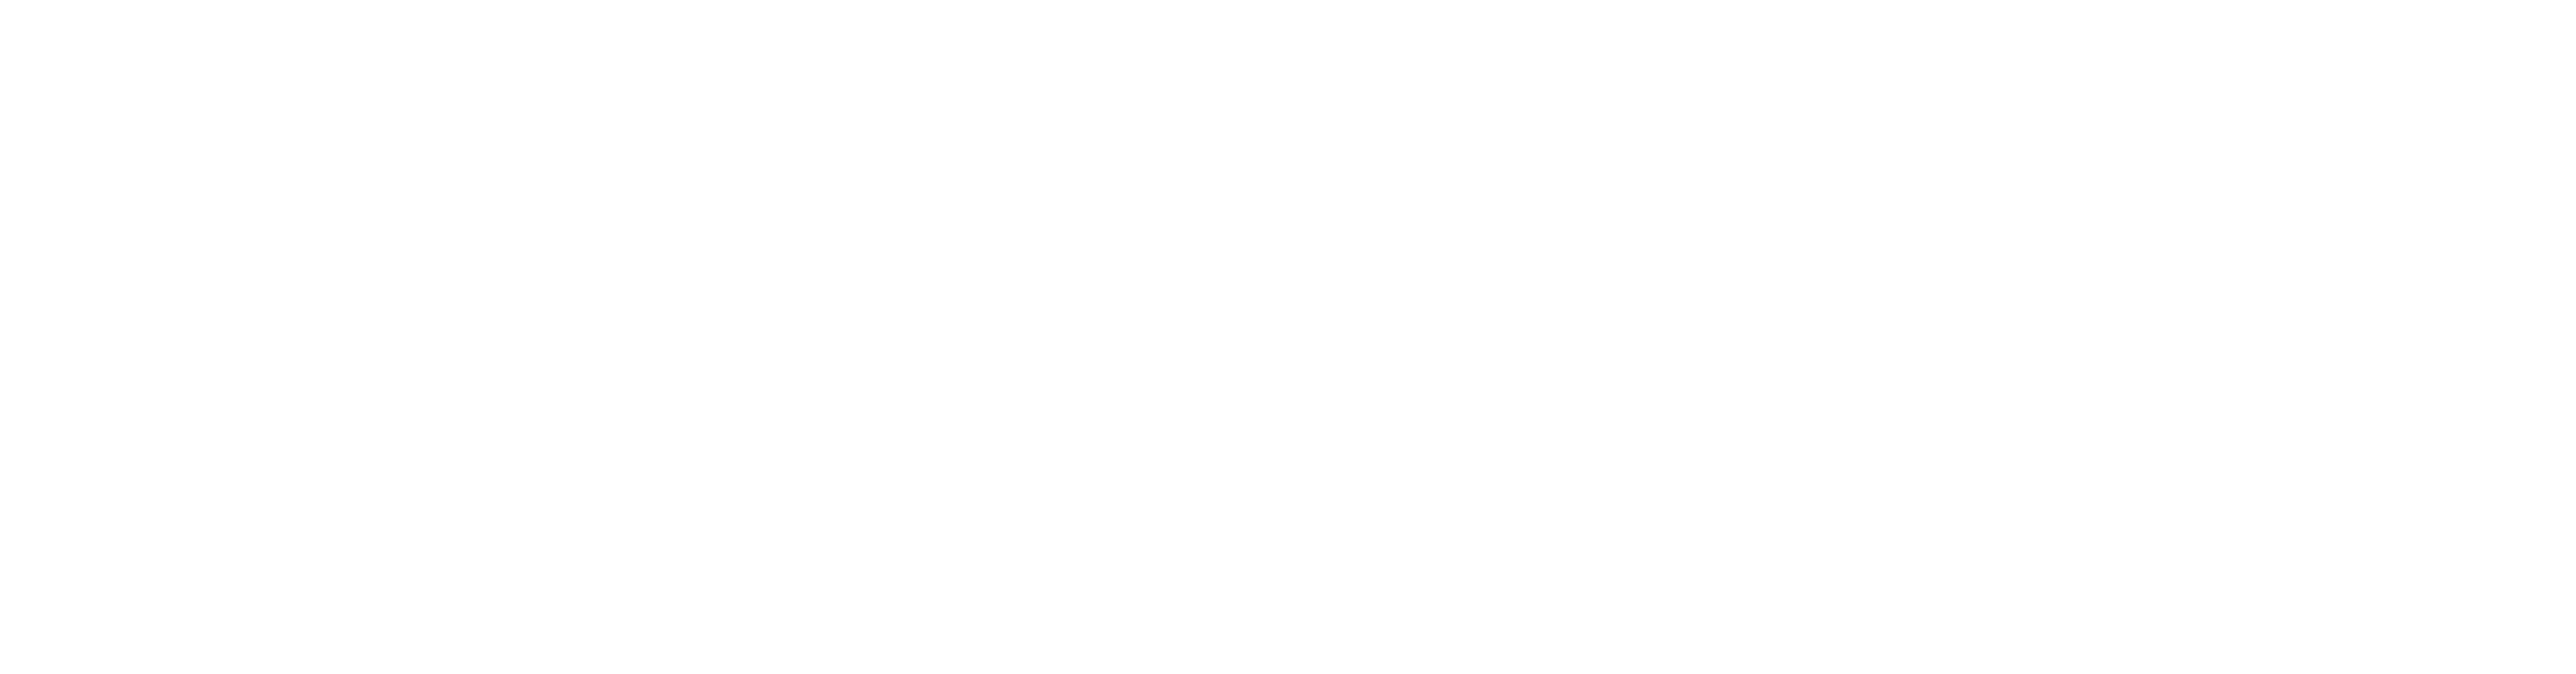 TheThingsConference